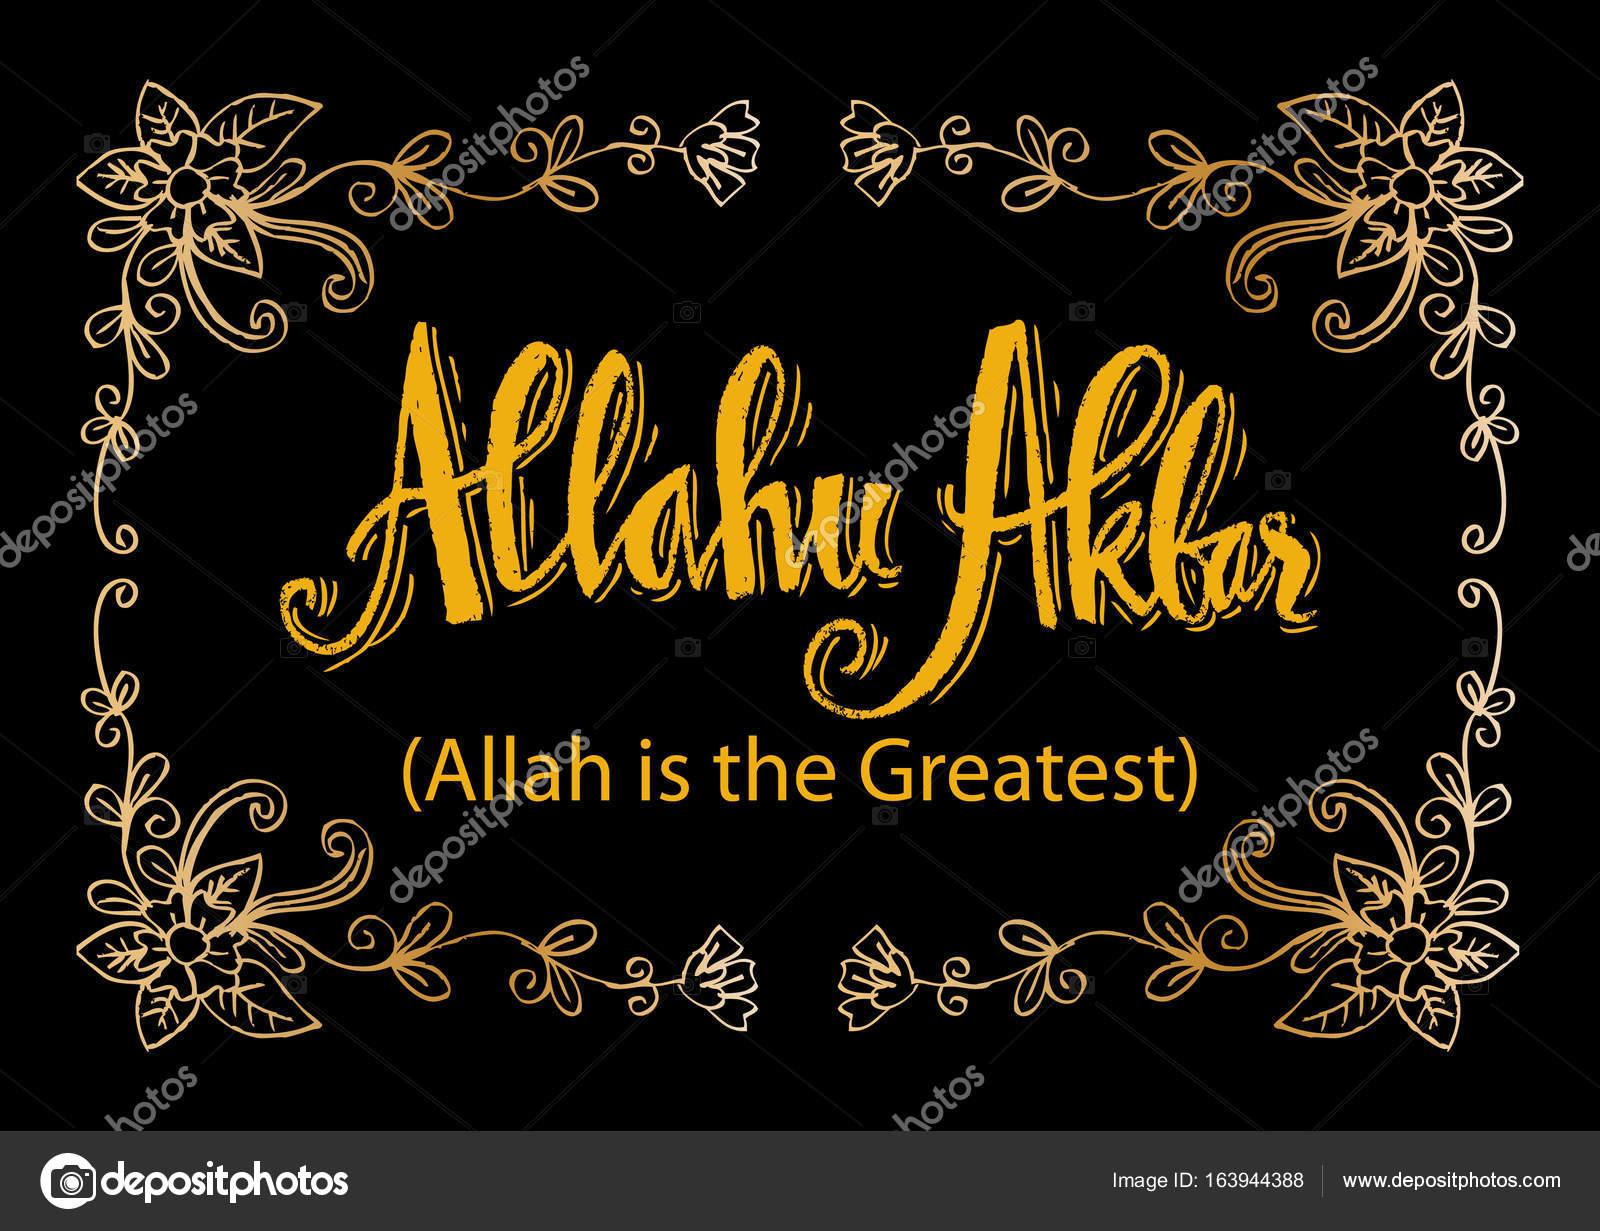 Allah Akbar Musique allahu akbar allah is the greatest — stock photo © handini #163944388